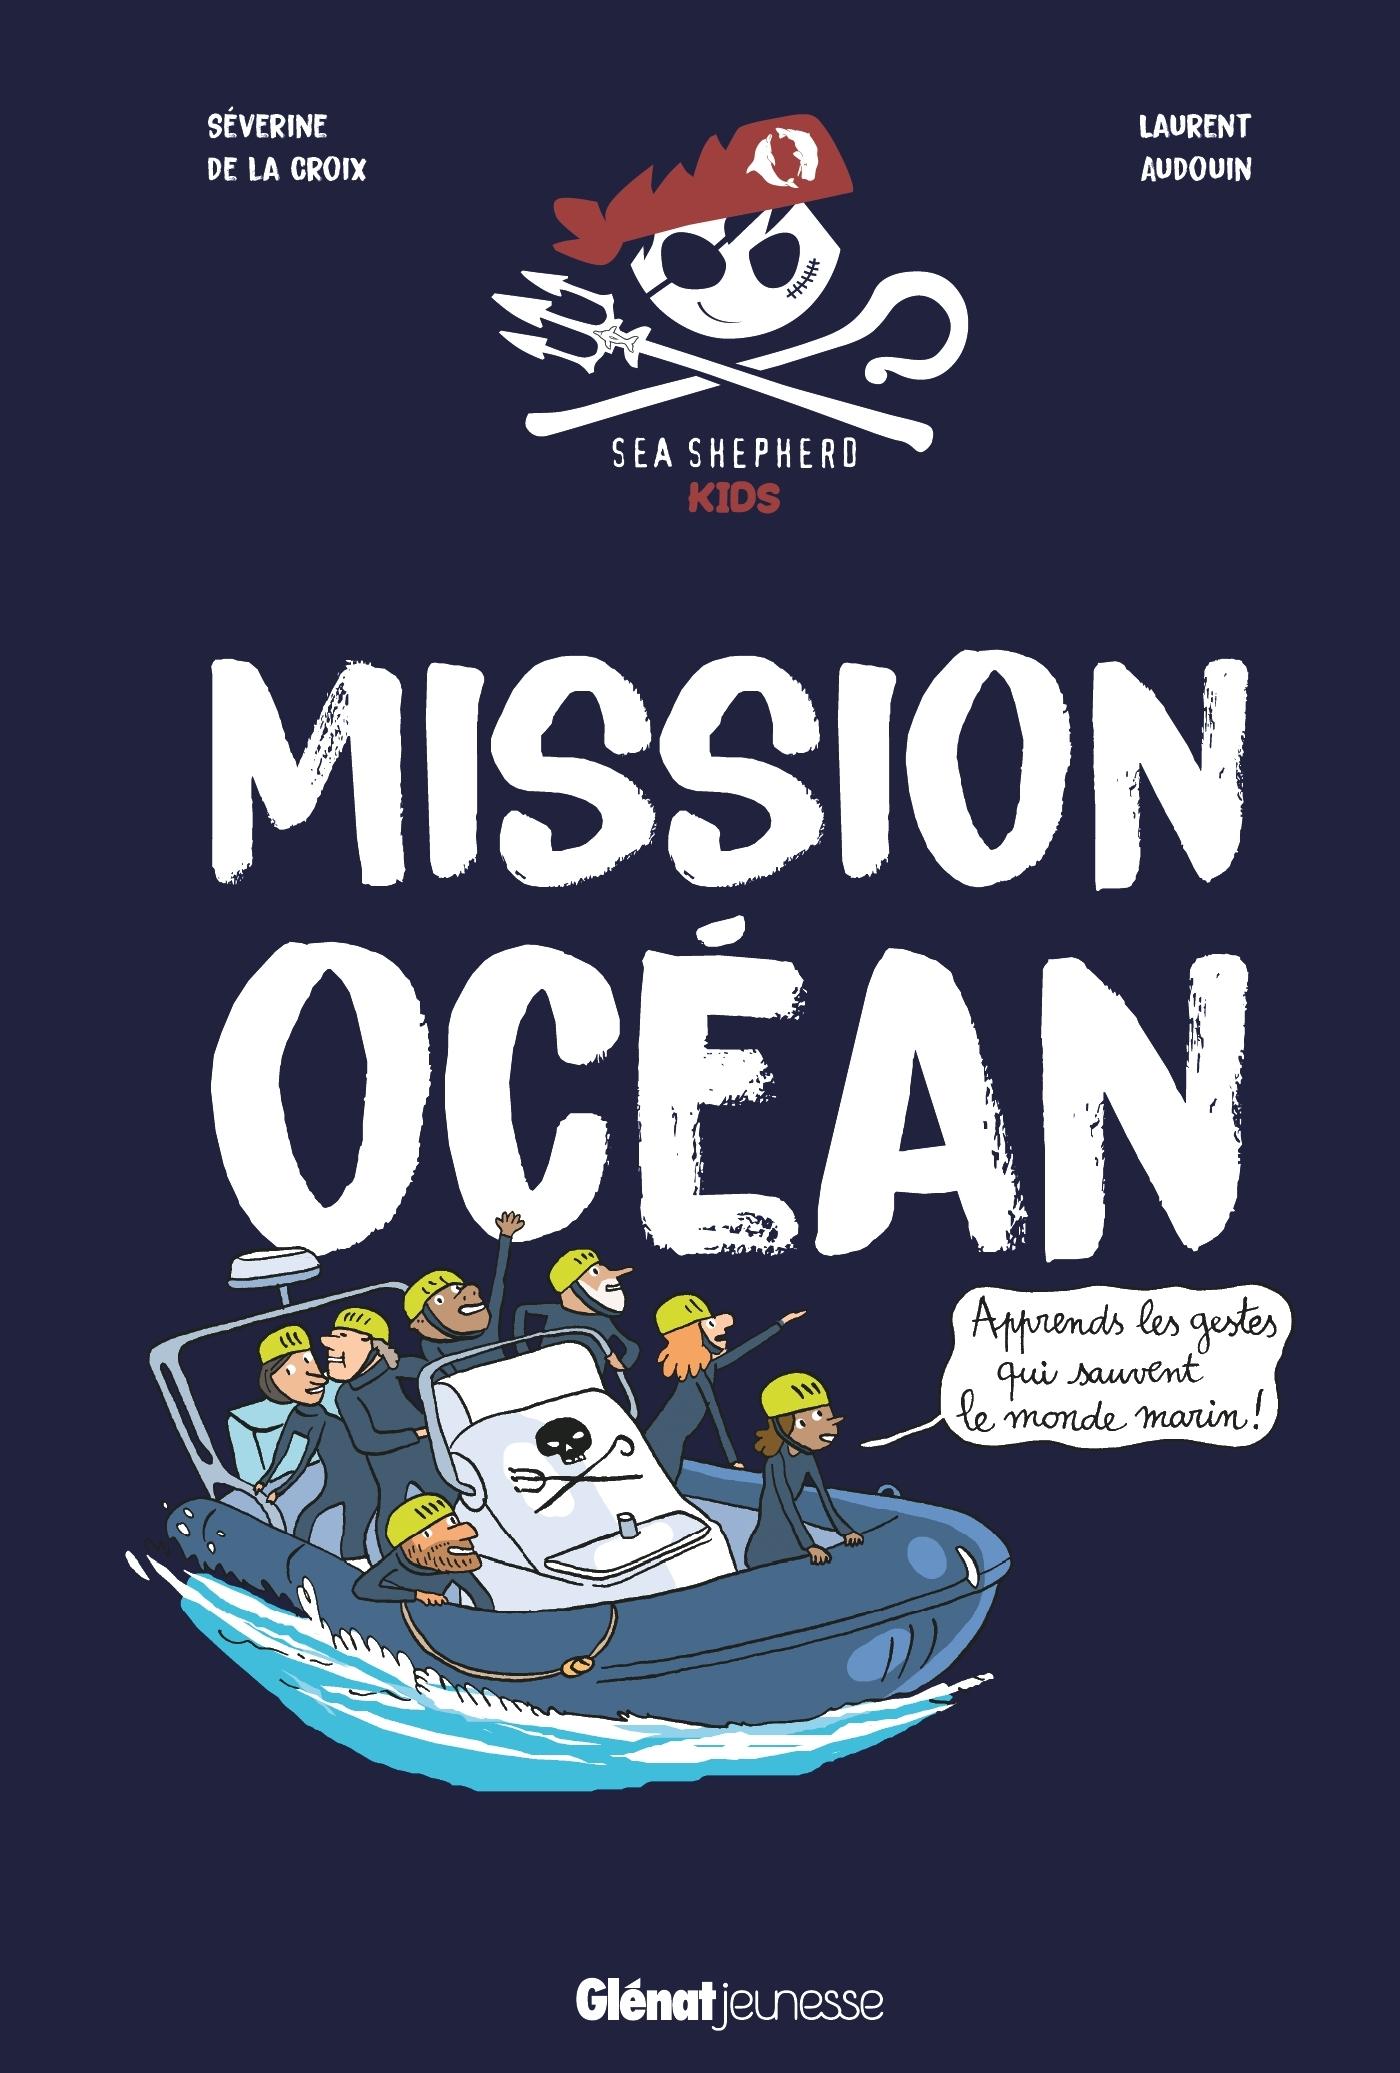 MISSION OCEAN - APPRENDS LES GESTES QUI SAUVENT LE MONDE MARIN !